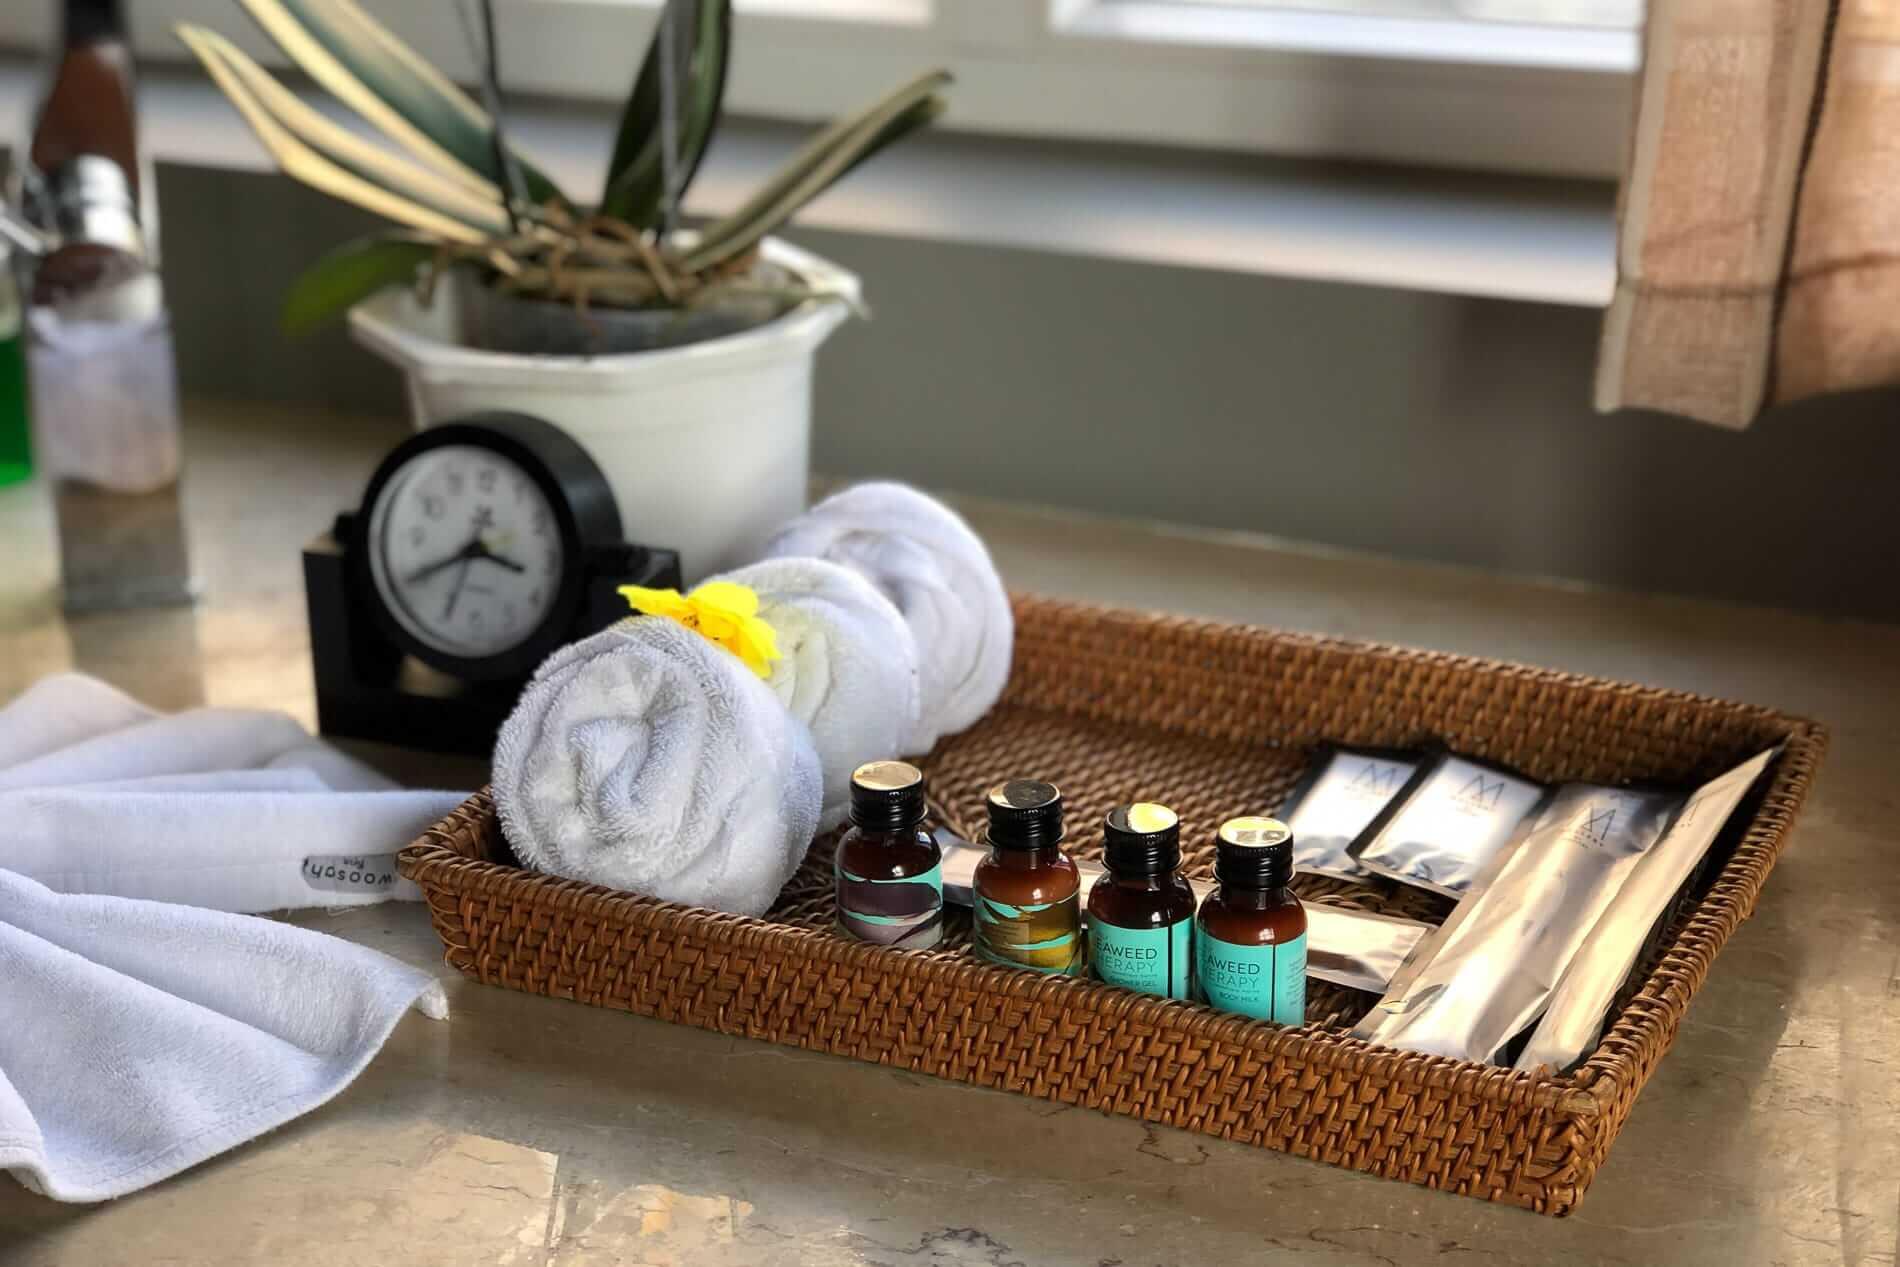 Essential oils used